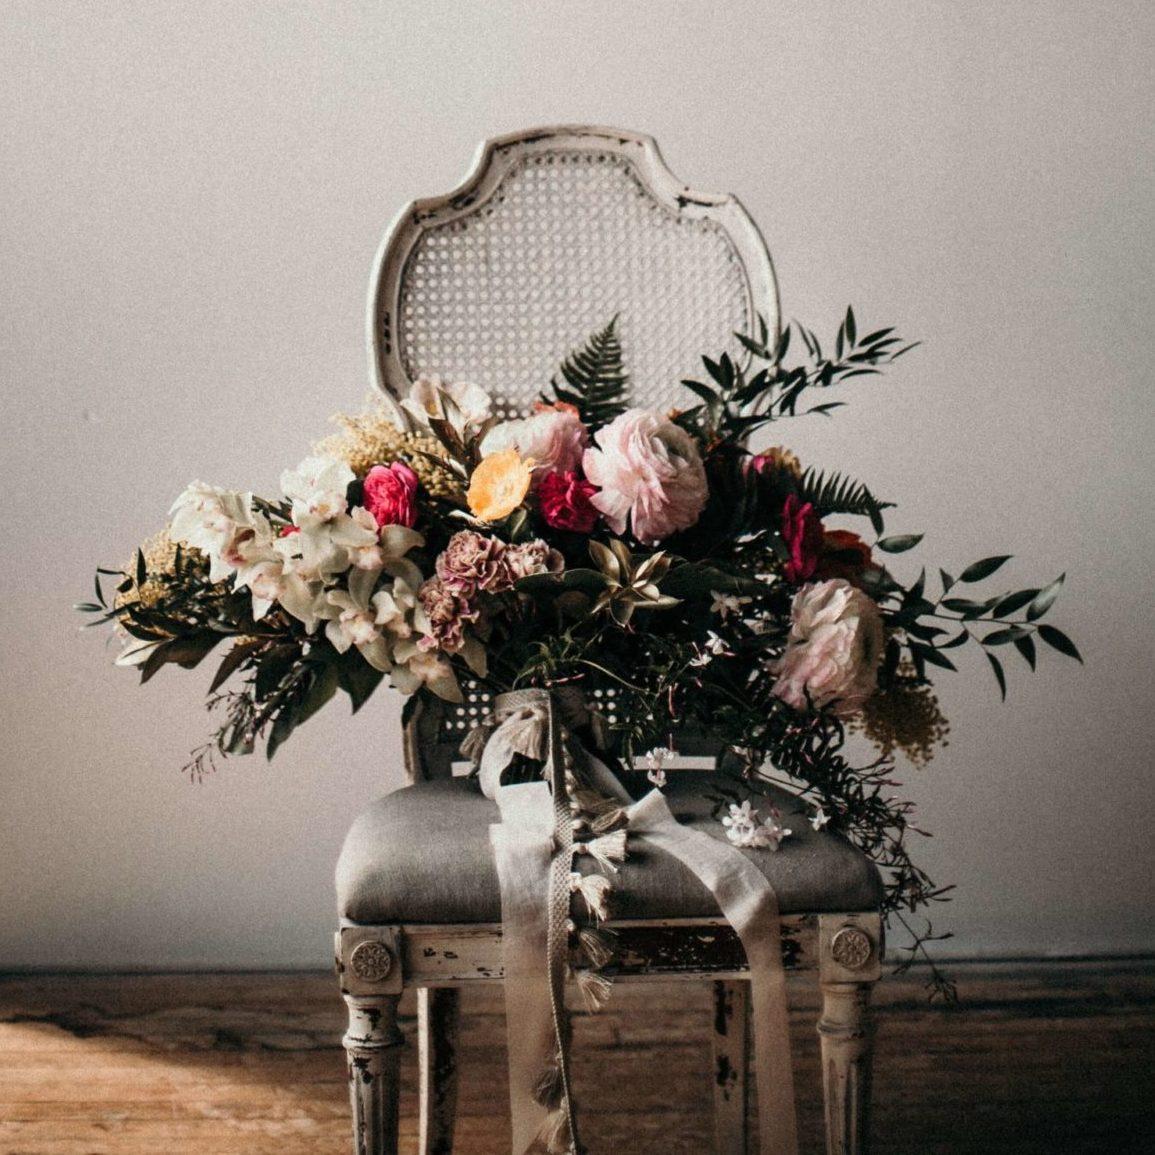 Image: Beautiful bridal floral bouquet on antique chair.